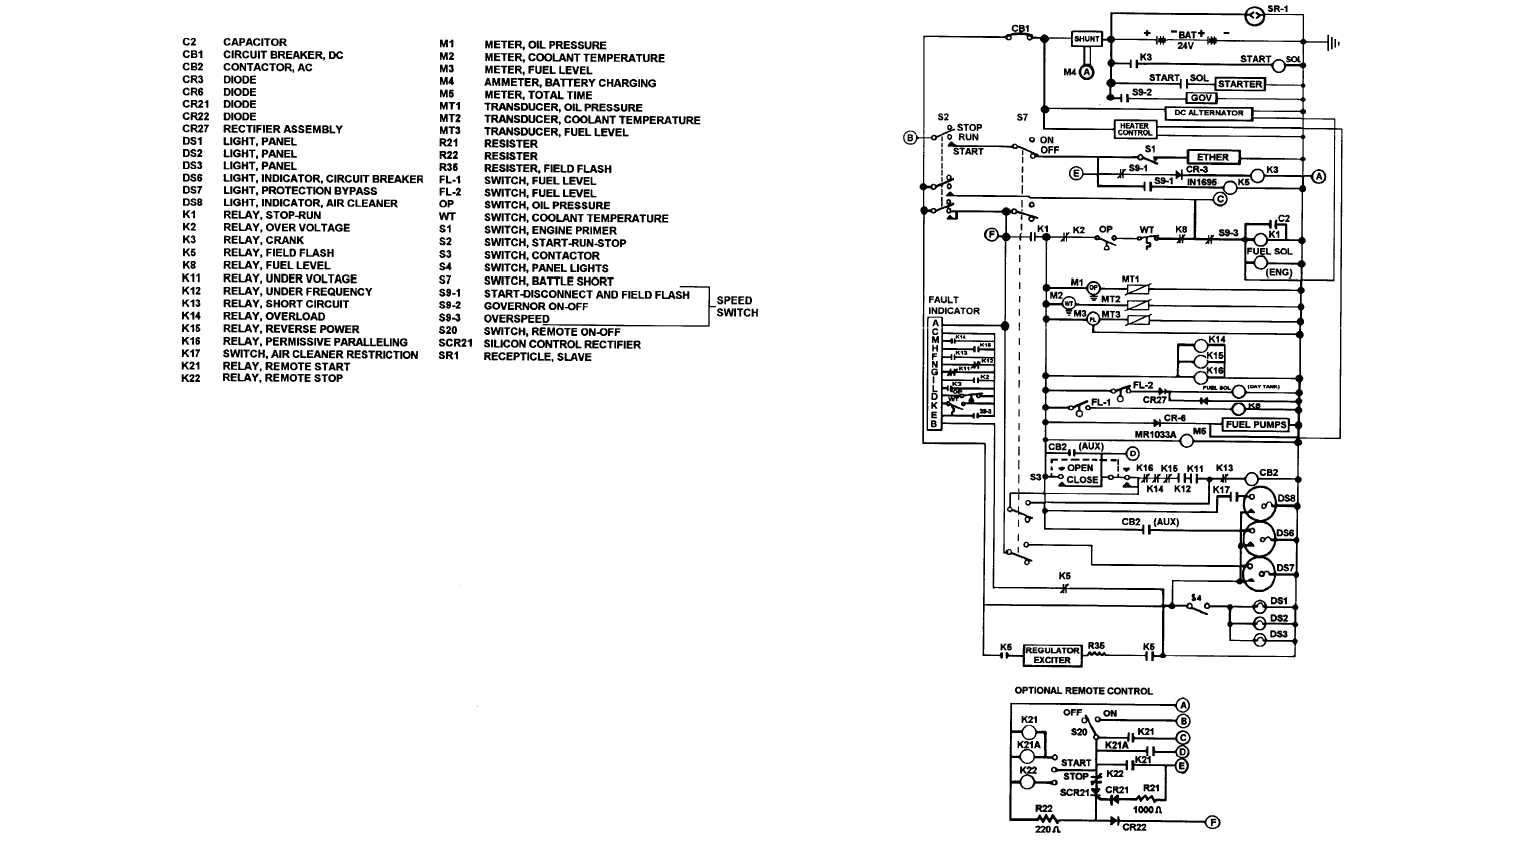 FO-6. DC Schematic